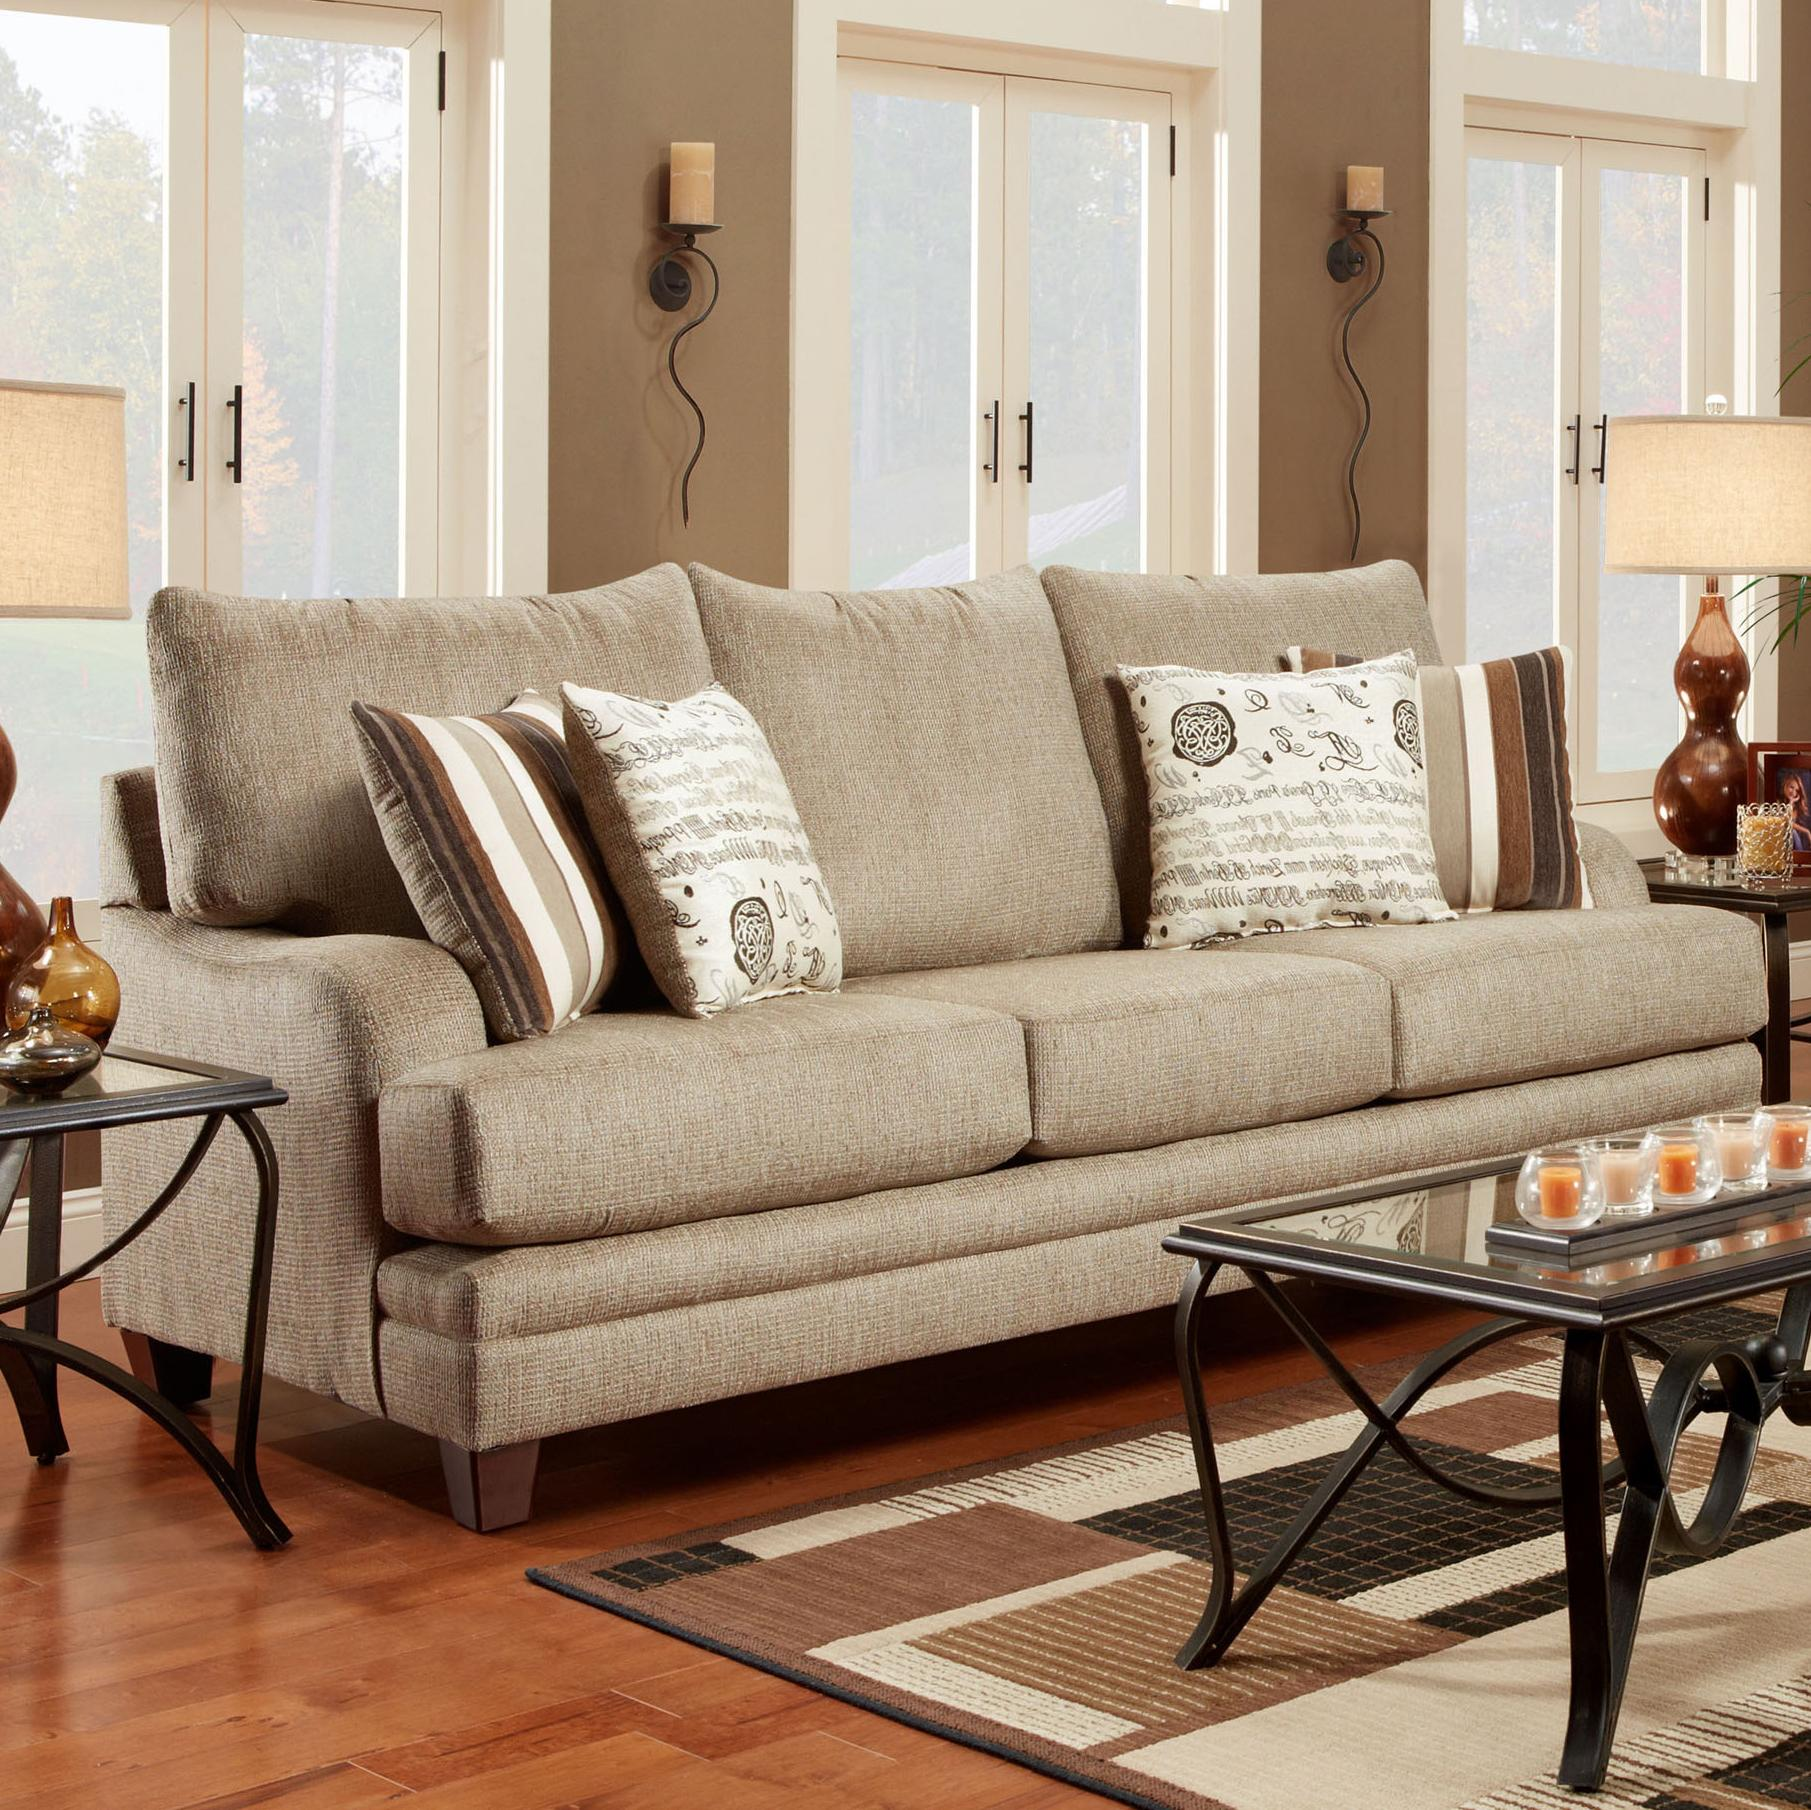 2230 Transitional Sofa by Washington Furniture at Lynn's Furniture & Mattress